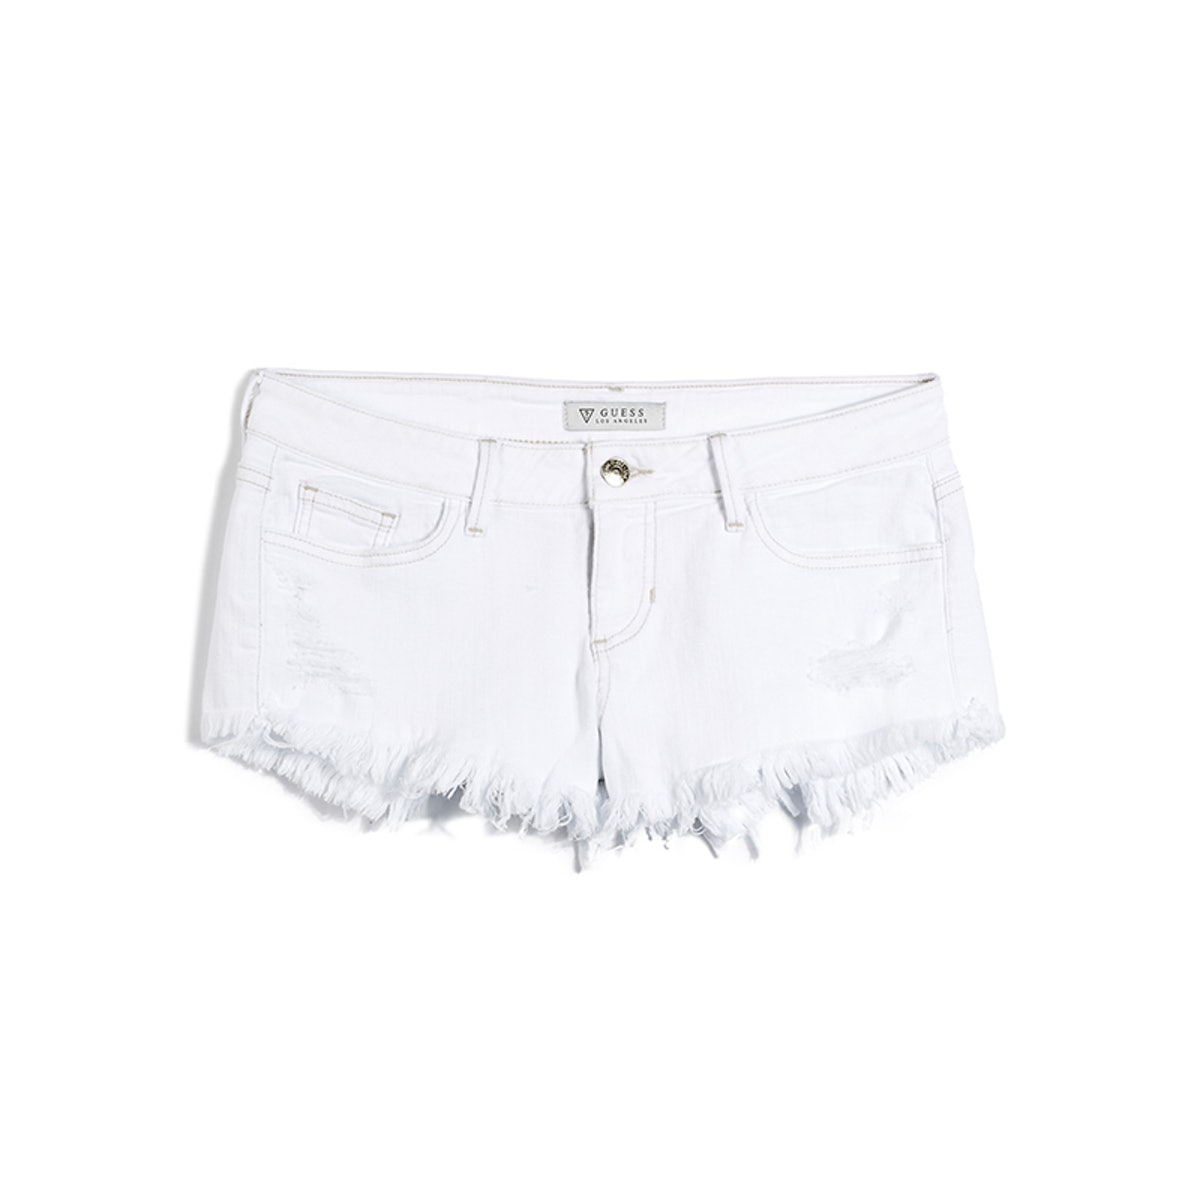 Kate Cutoff Denim Shorts In White Overdyed Destroyed Wash